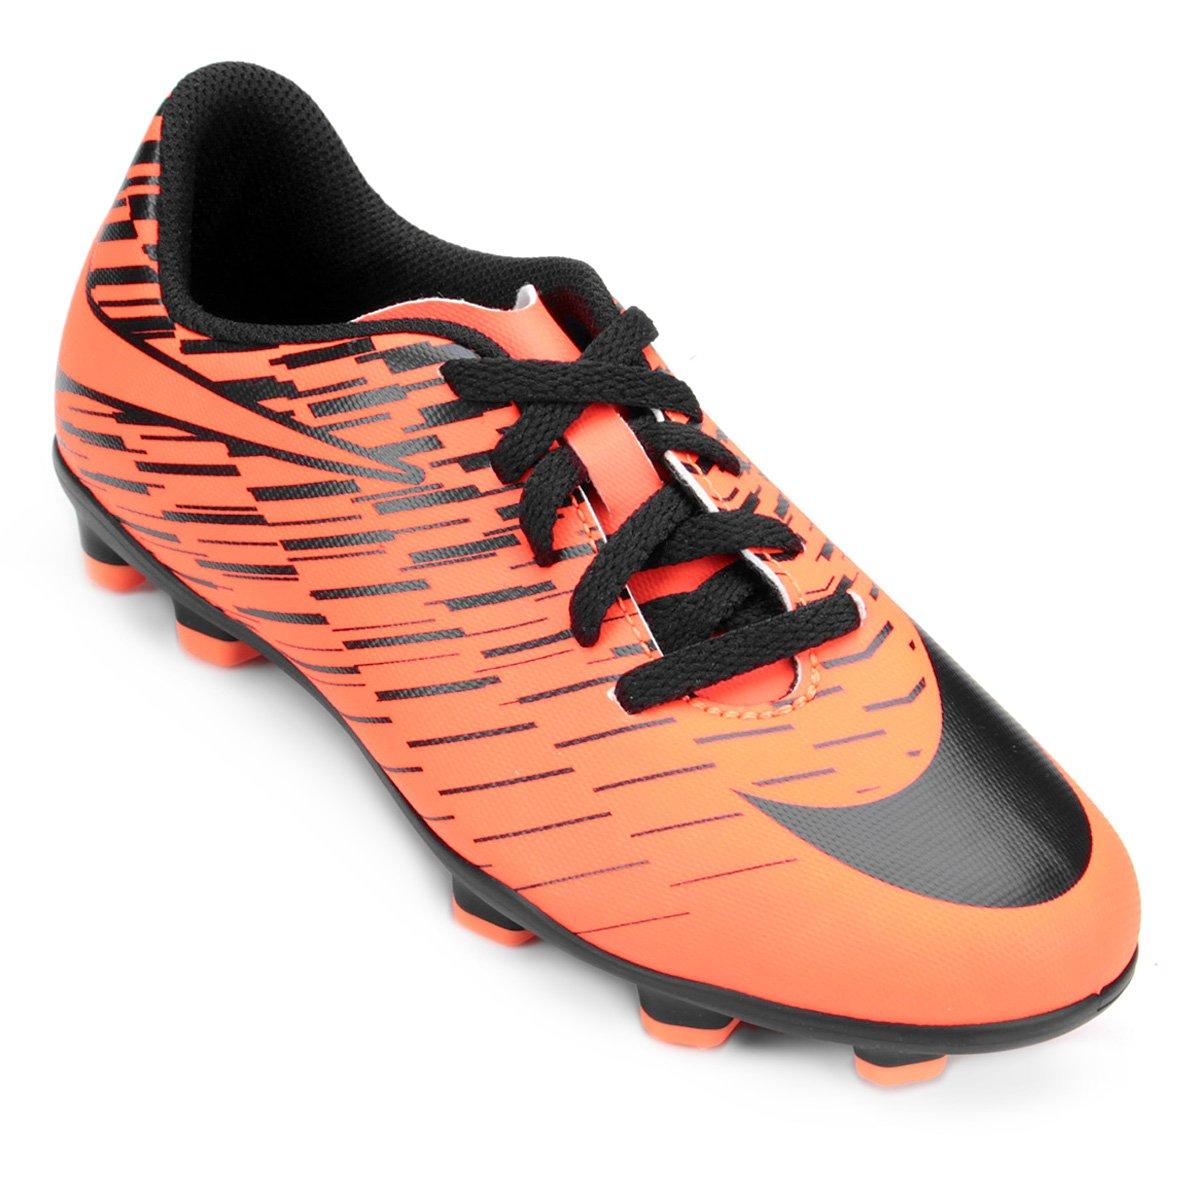 70aa05ad15 Chuteira Campo Infantil Nike Bravata II FG